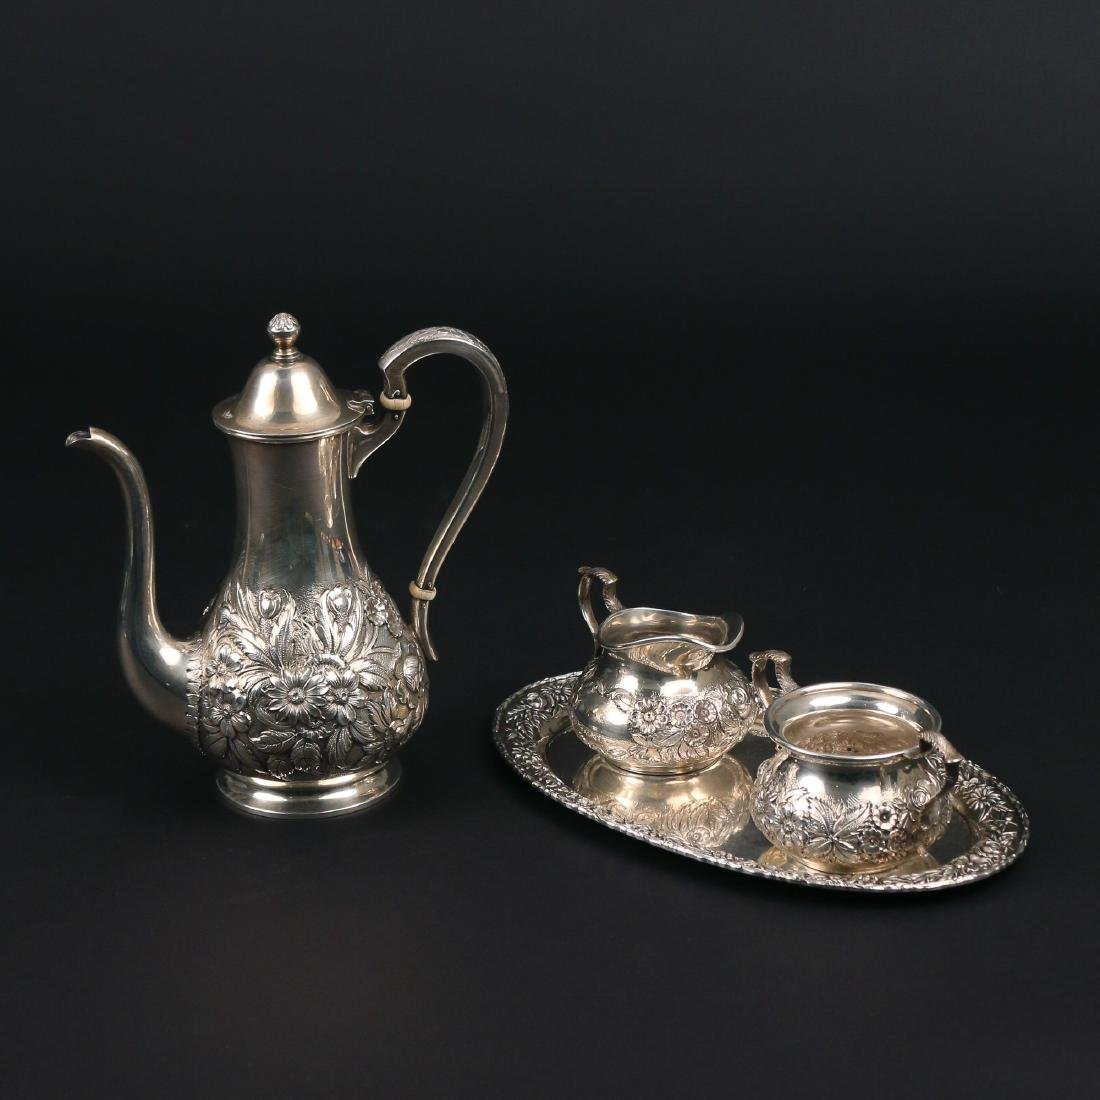 (4pc) S. KIRK & SON STERLING SILVER TEA SET